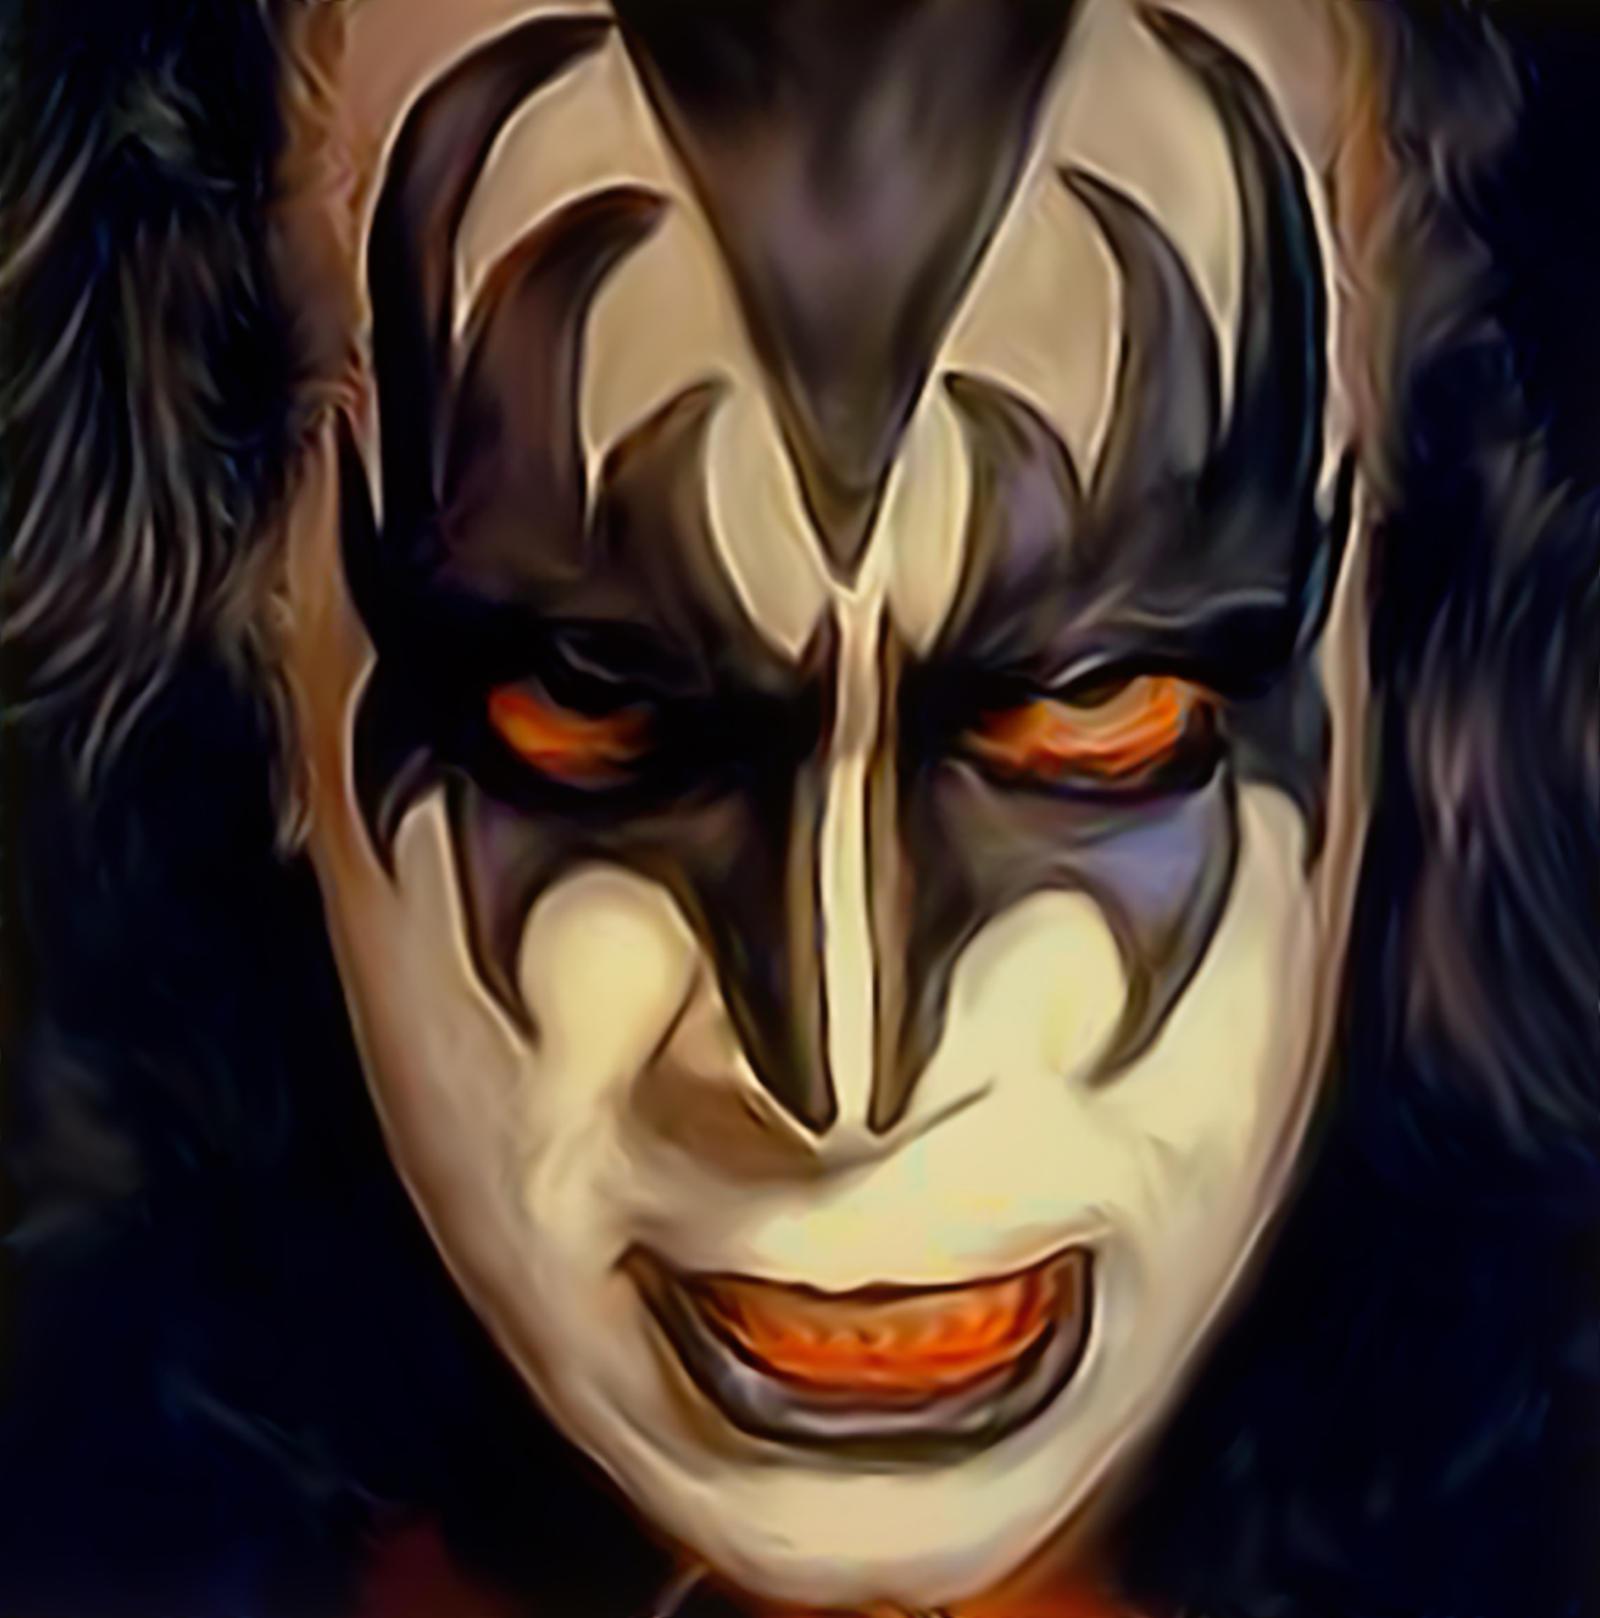 Kiss Demon Makeup: Gene Simmons The Demon By Petnick On DeviantArt